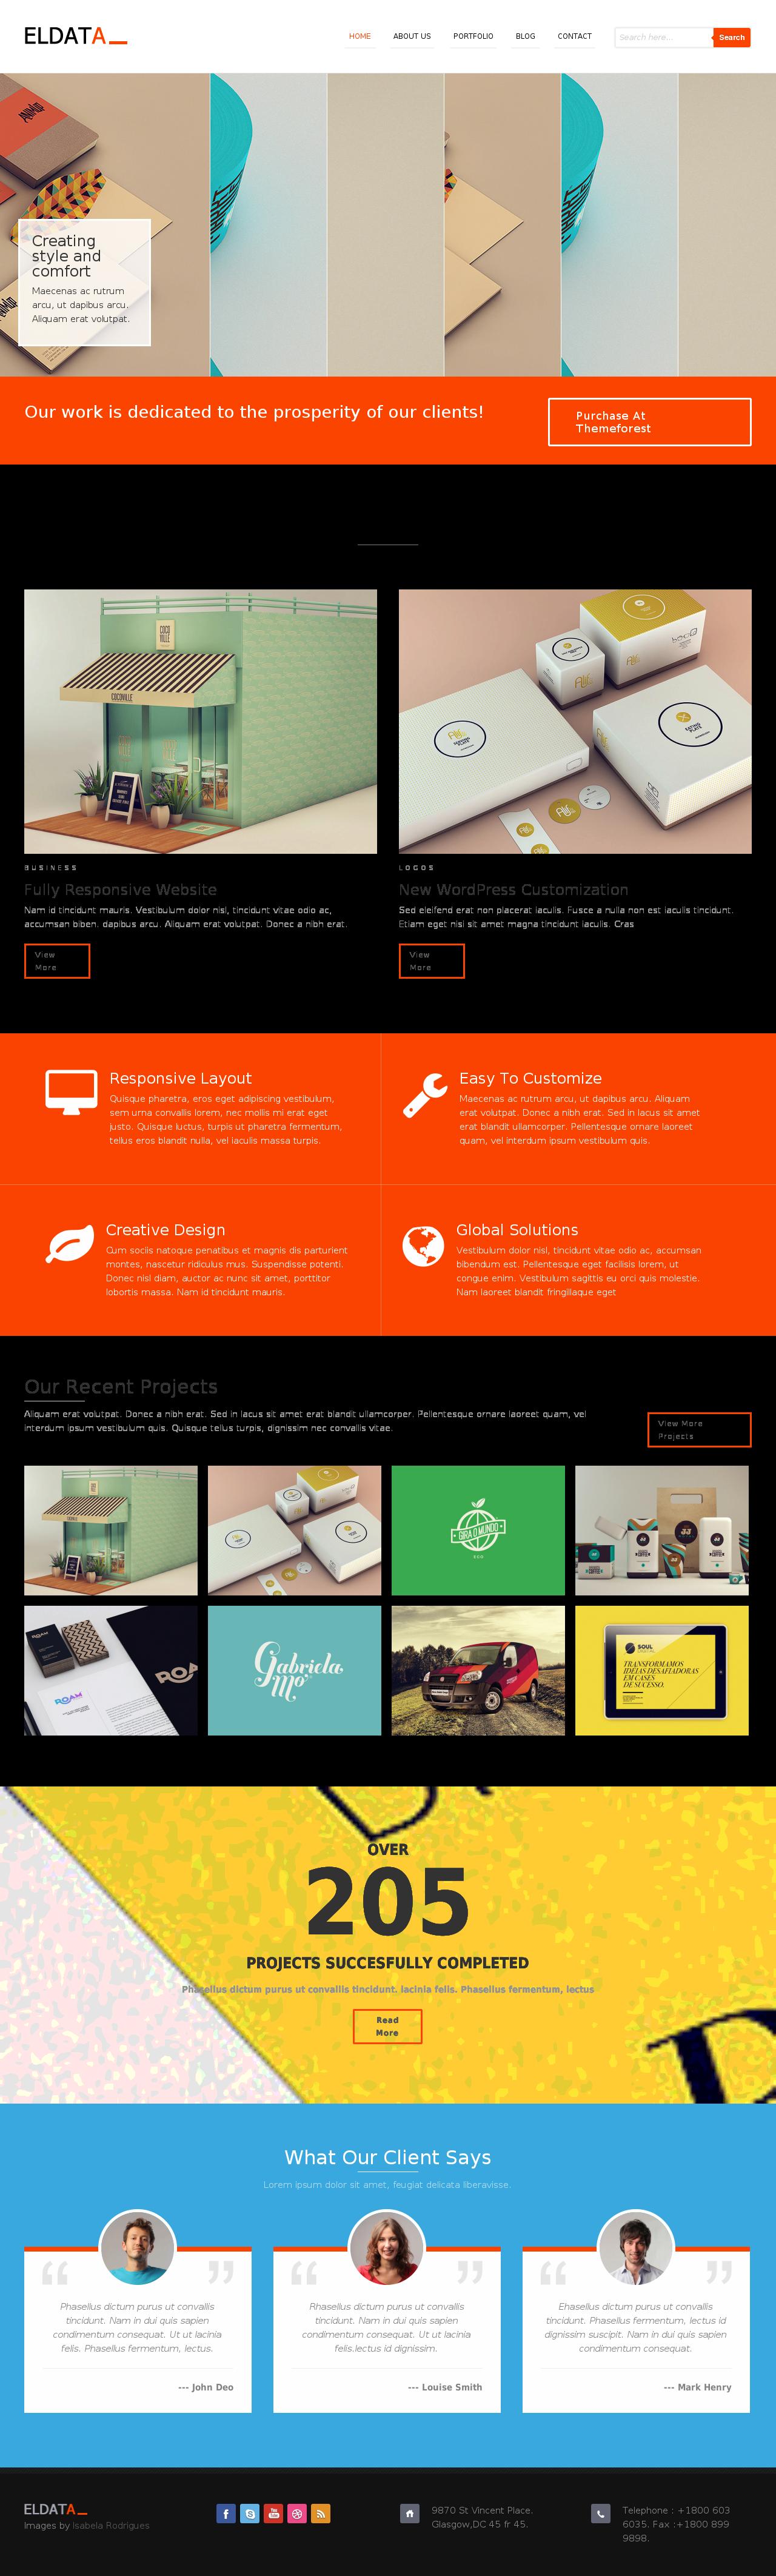 eldata responsive html template